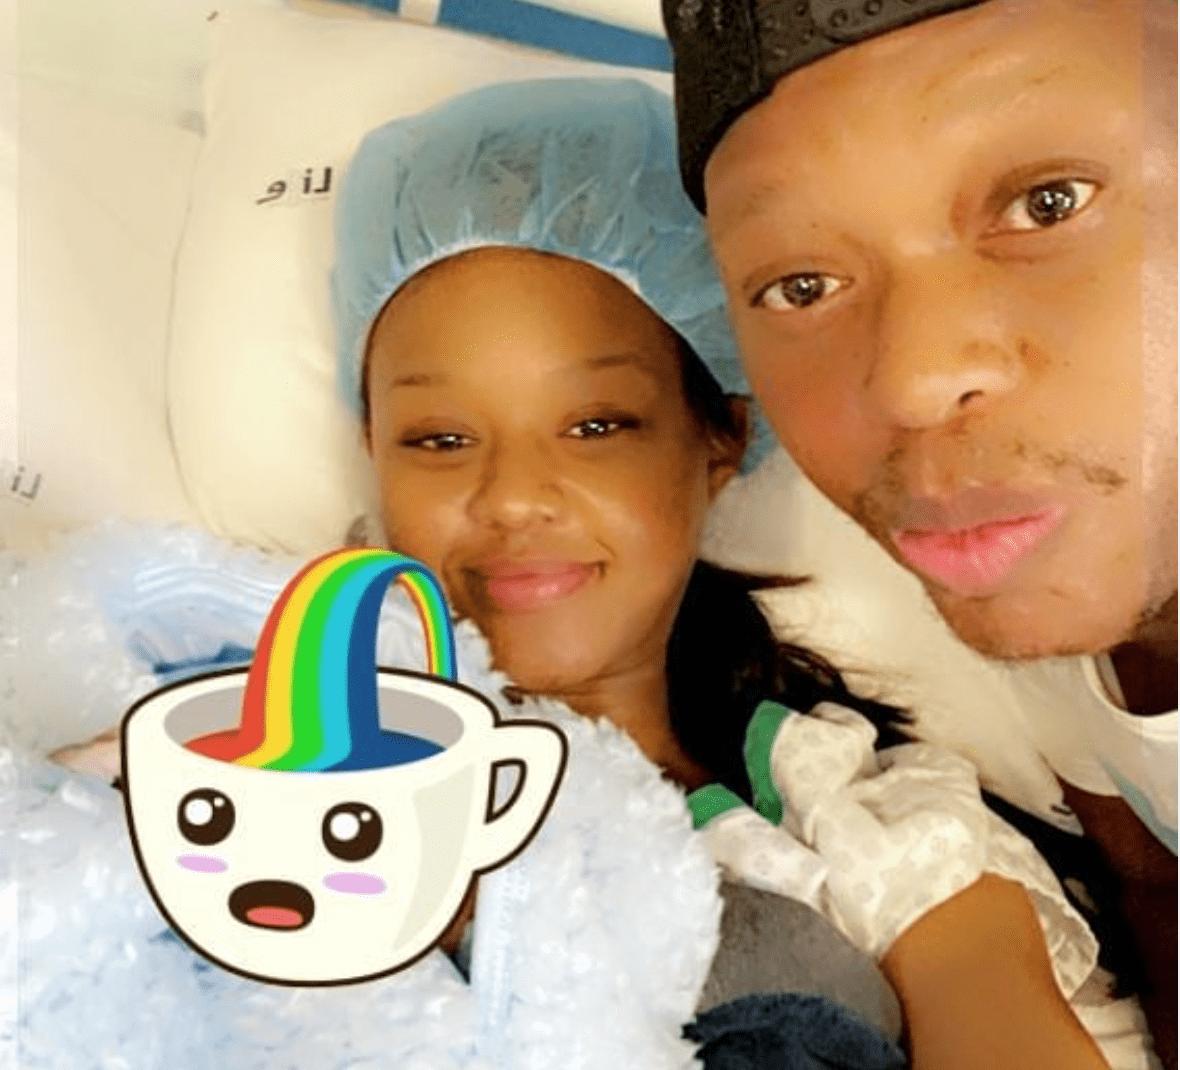 Meet Sponge Wodumo: Babes Wodumo and Mampintsha create social media account for their baby boy